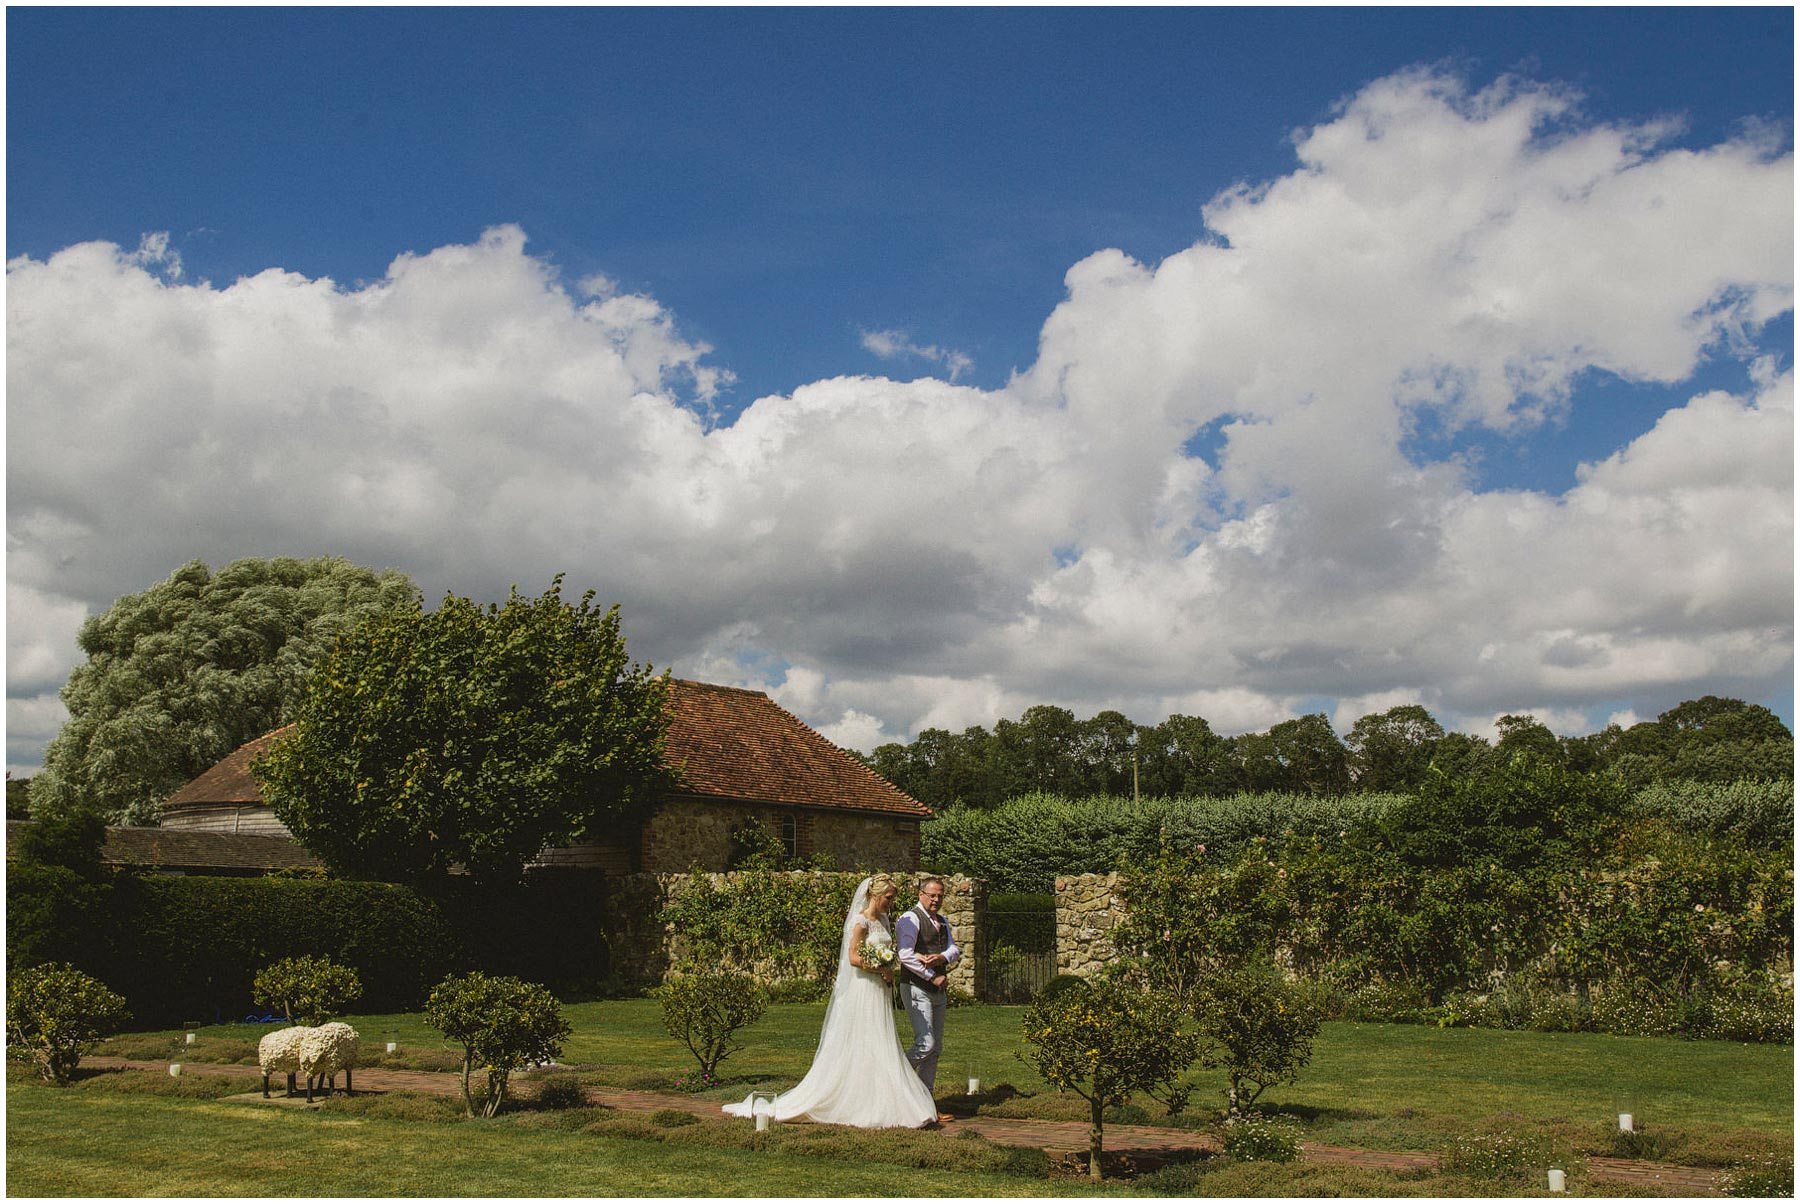 Kent-Festival-Tipi-wedding-photography_0055